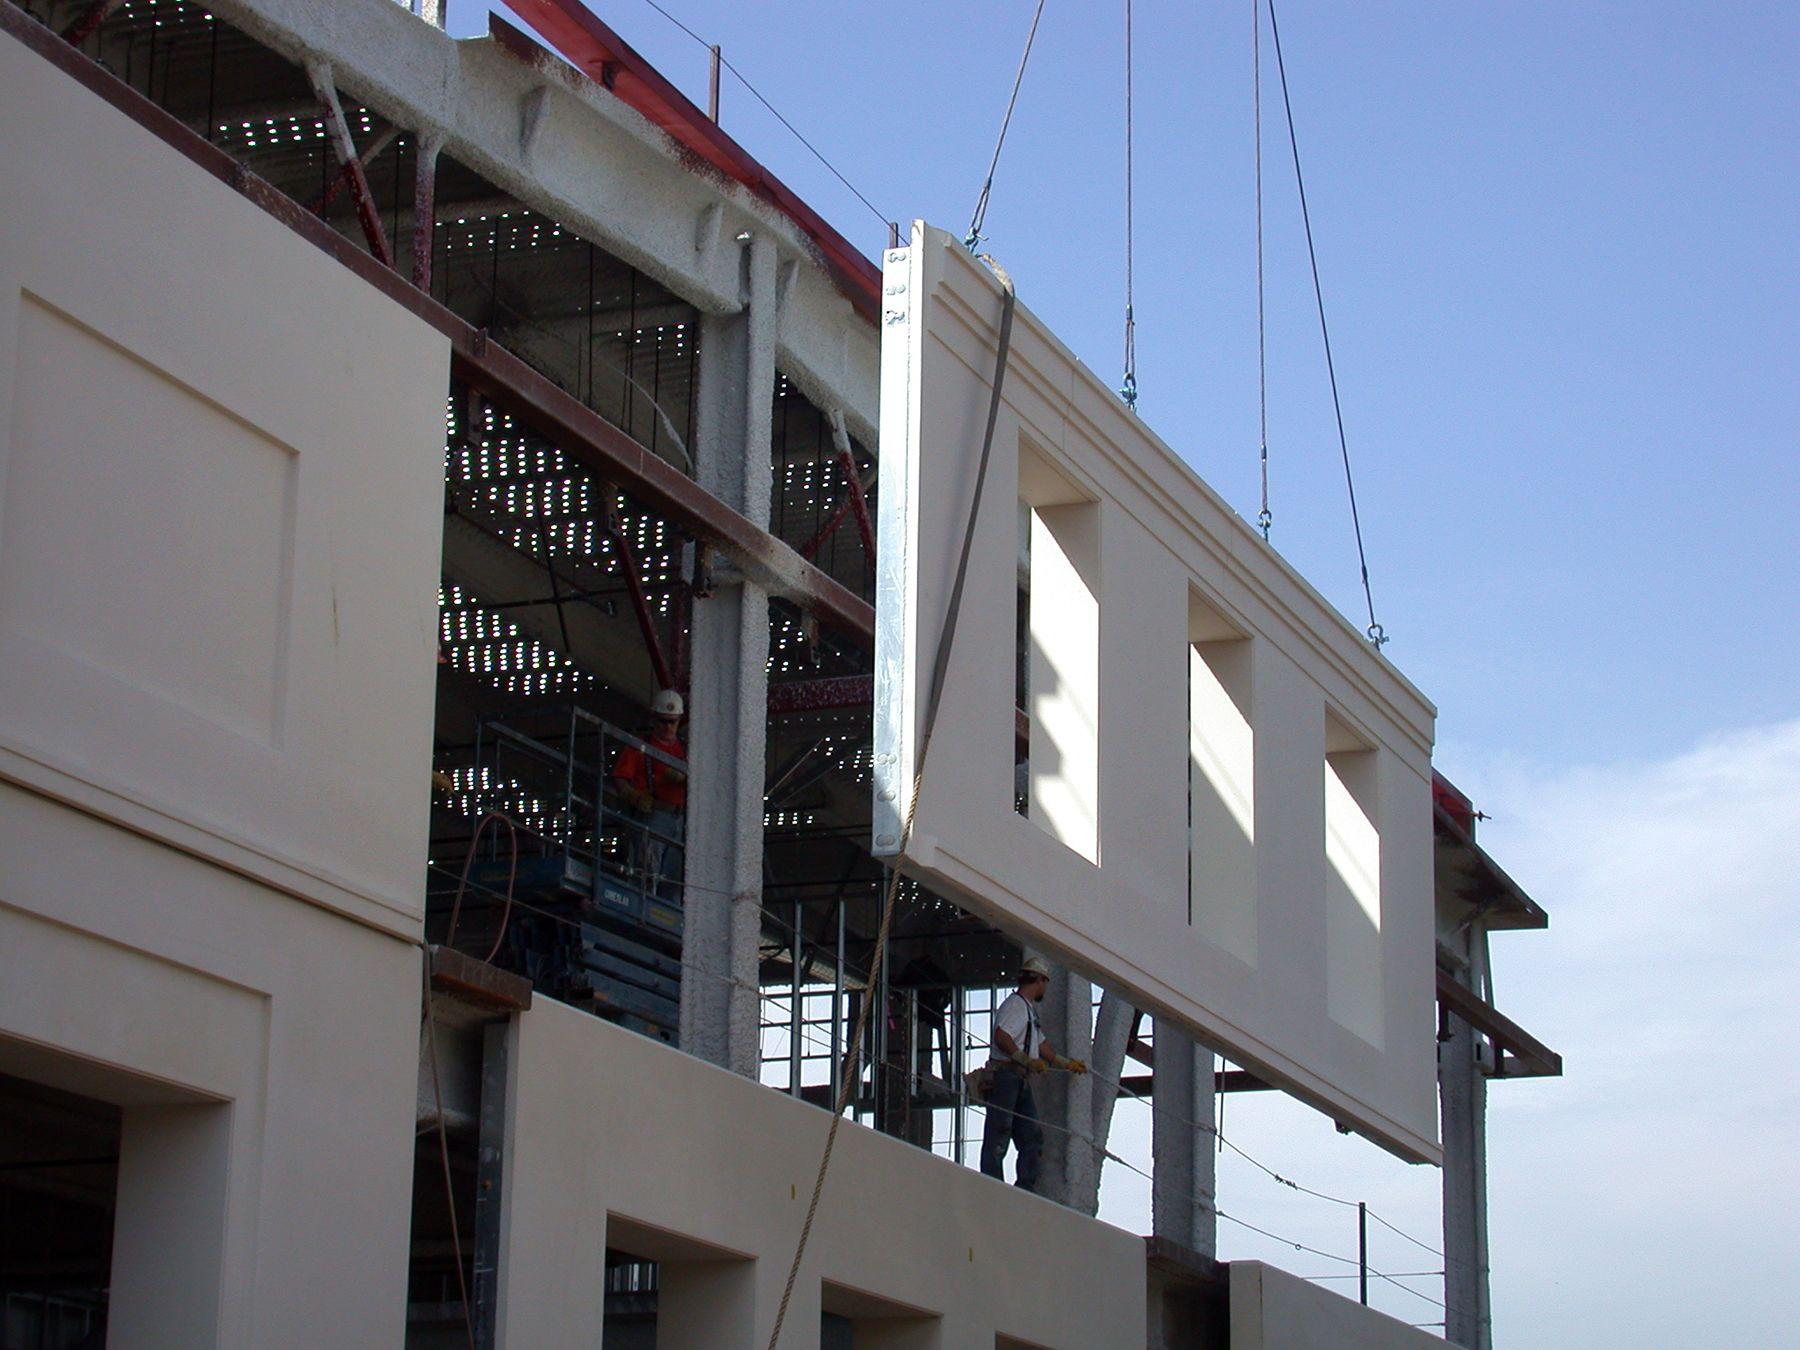 Precast Concrete Wall Panel Install Jpg 1800 215 1350 West